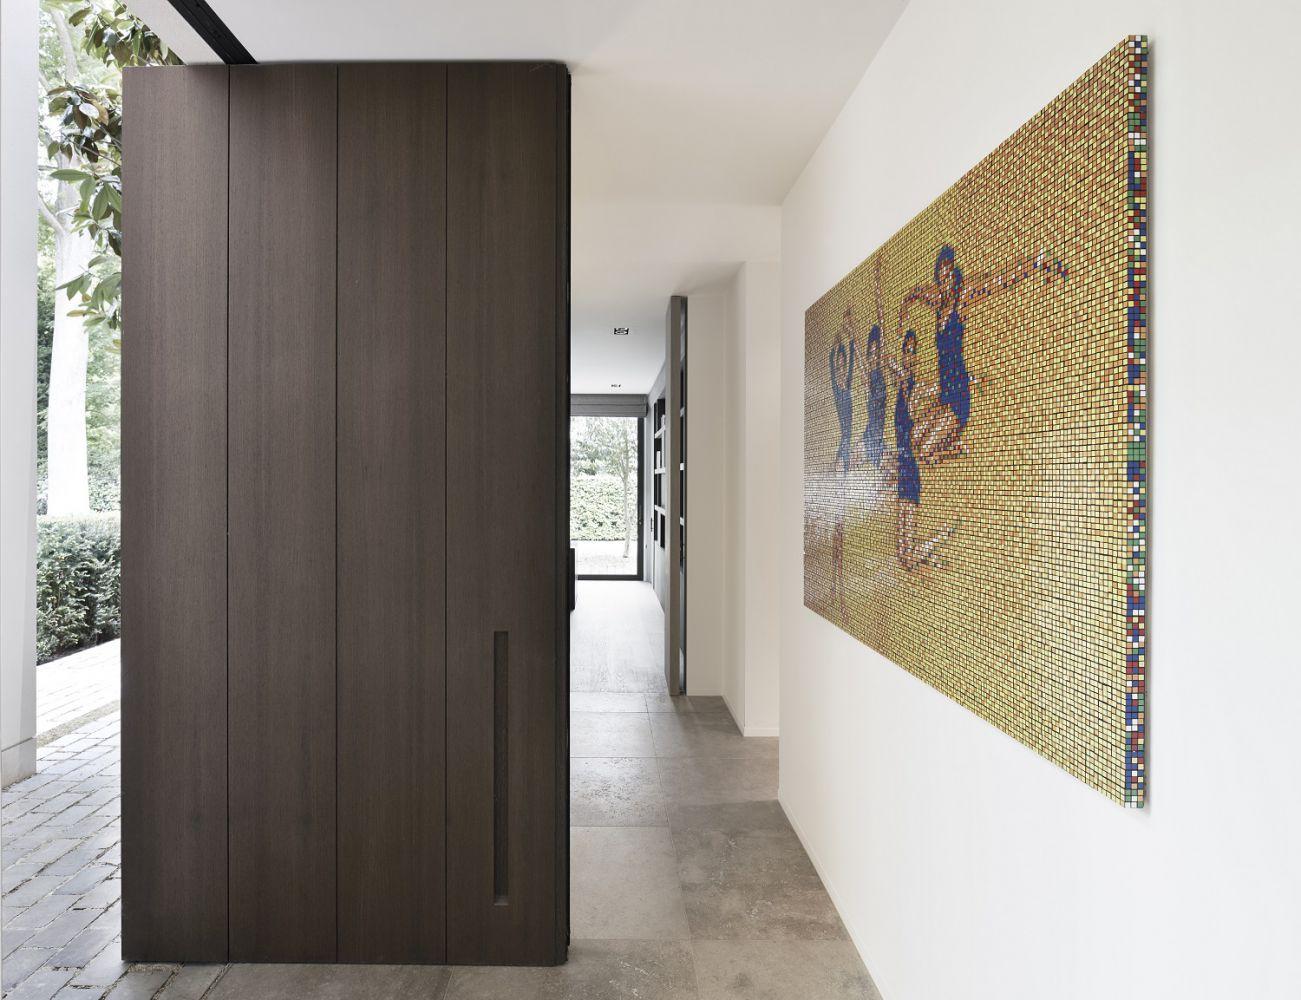 Moderne kunst woonkamer modern huis woonkamer royalty vrije